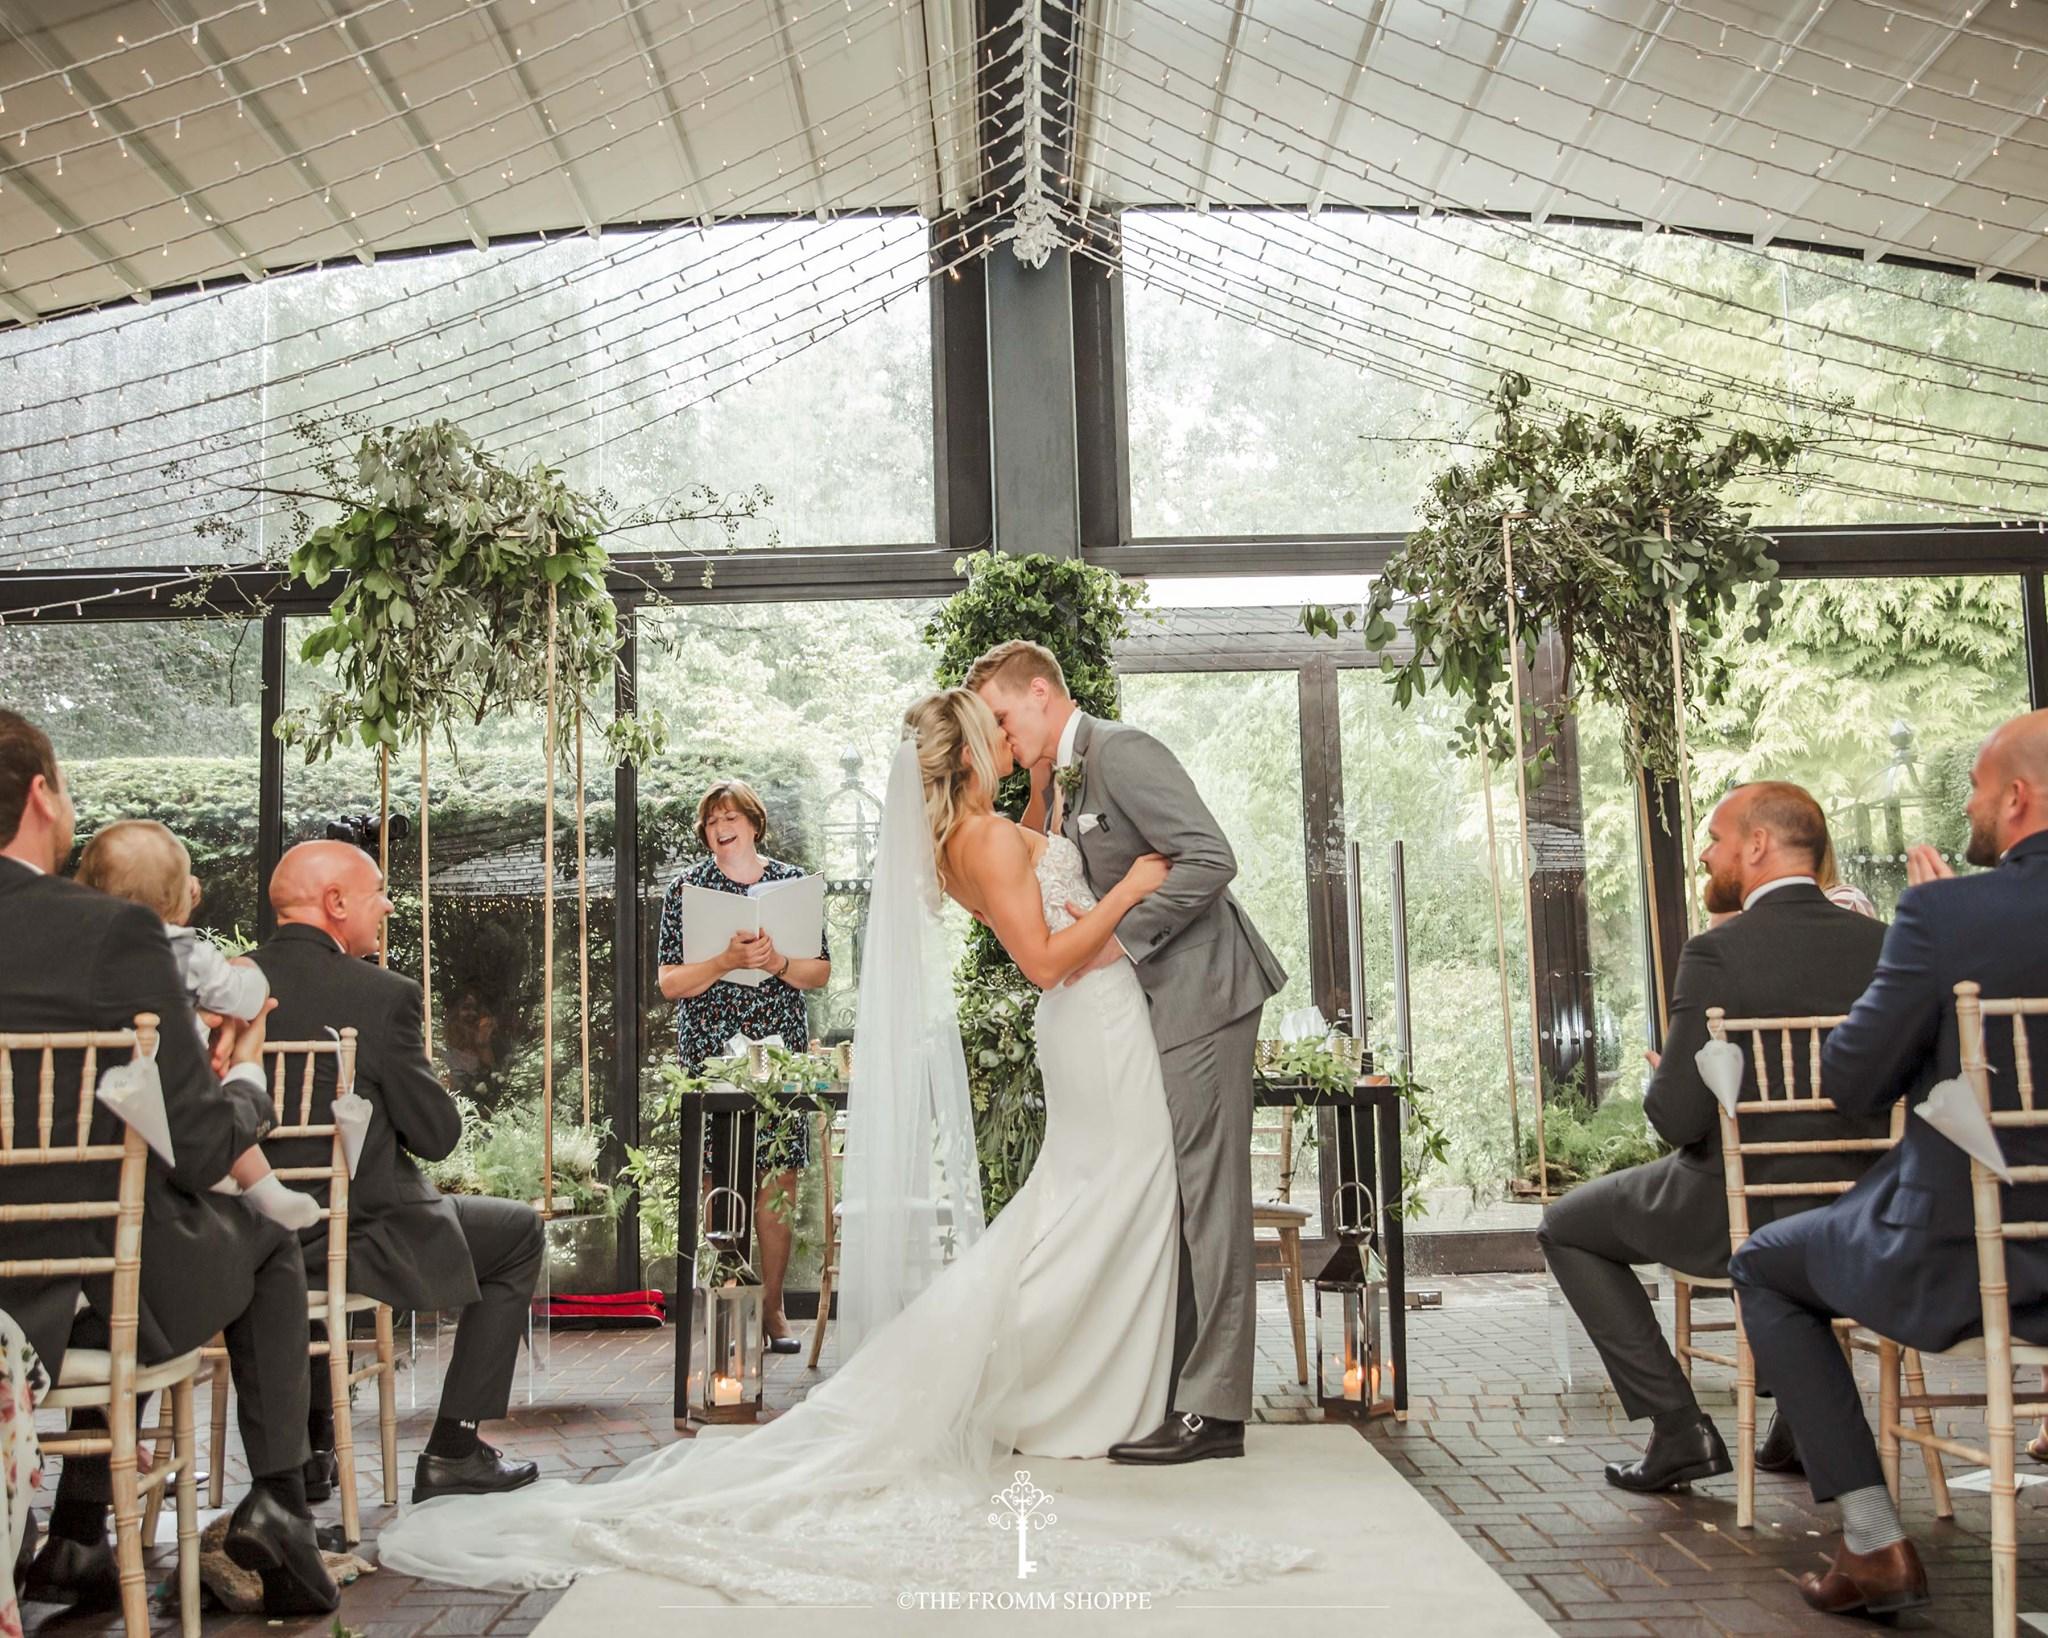 Rosemary & Jonathan – A Wedding Far, Far Away